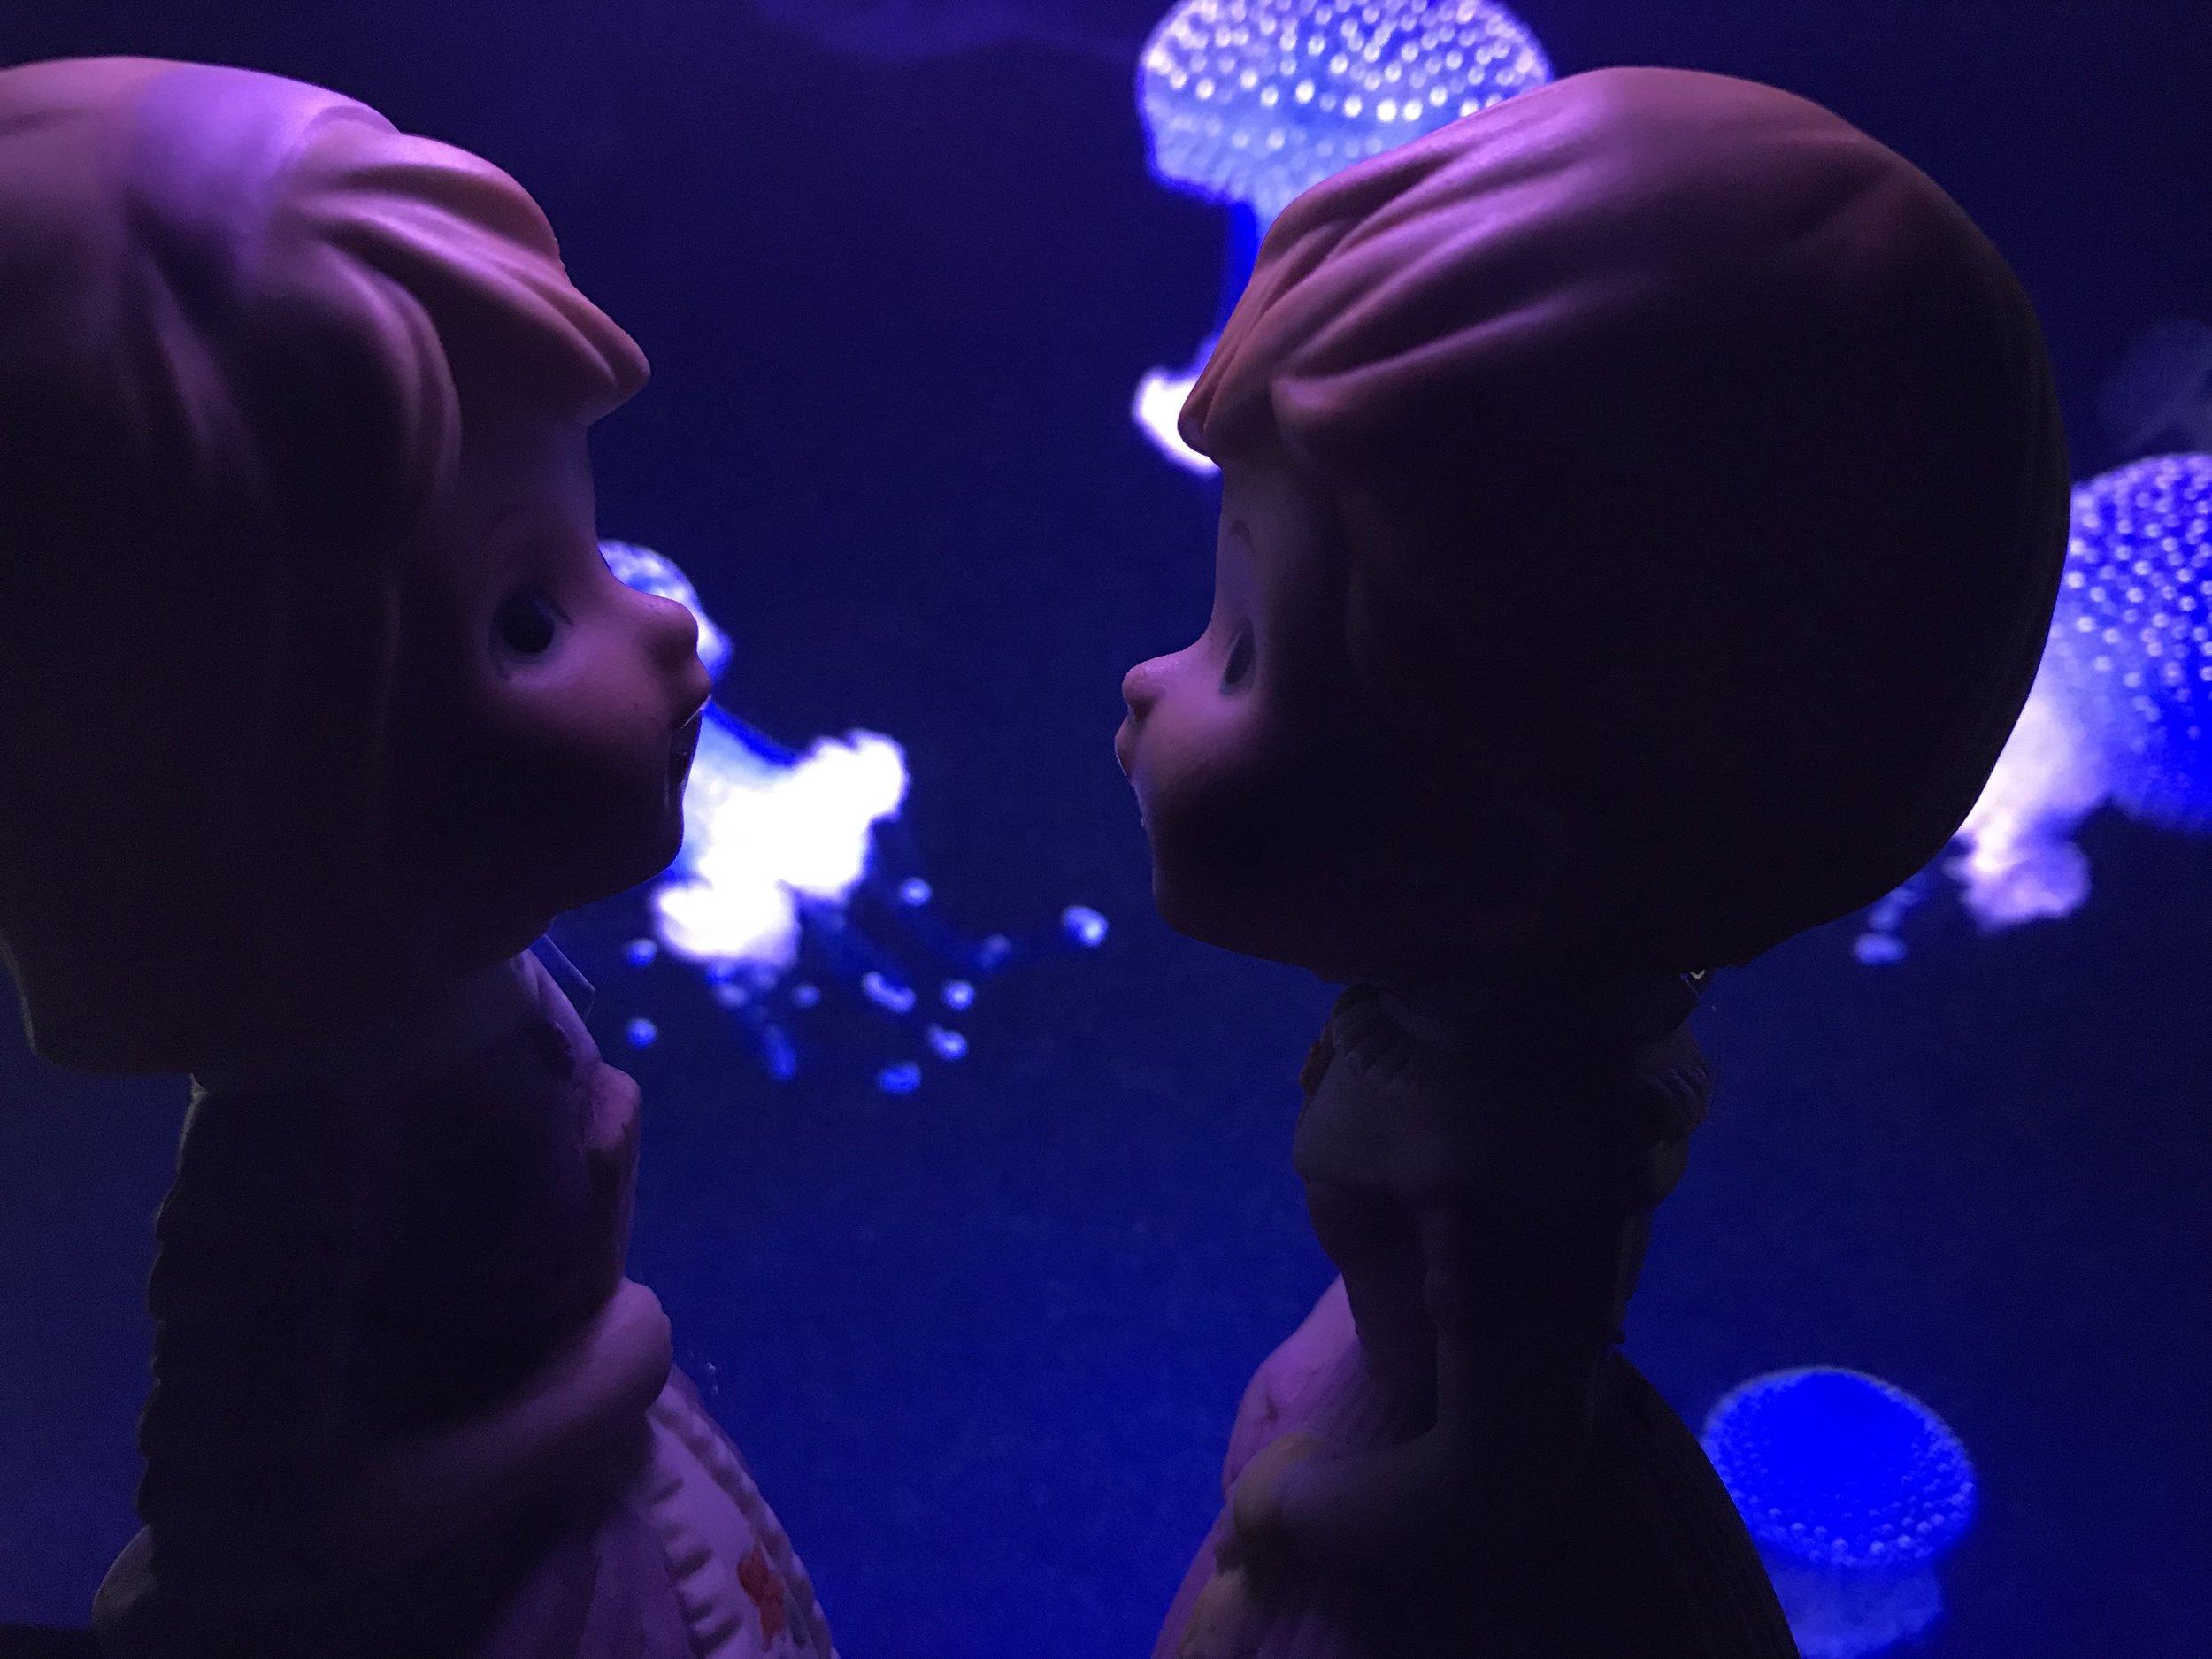 Rollins_cephalophoresjellyfish.jpeg